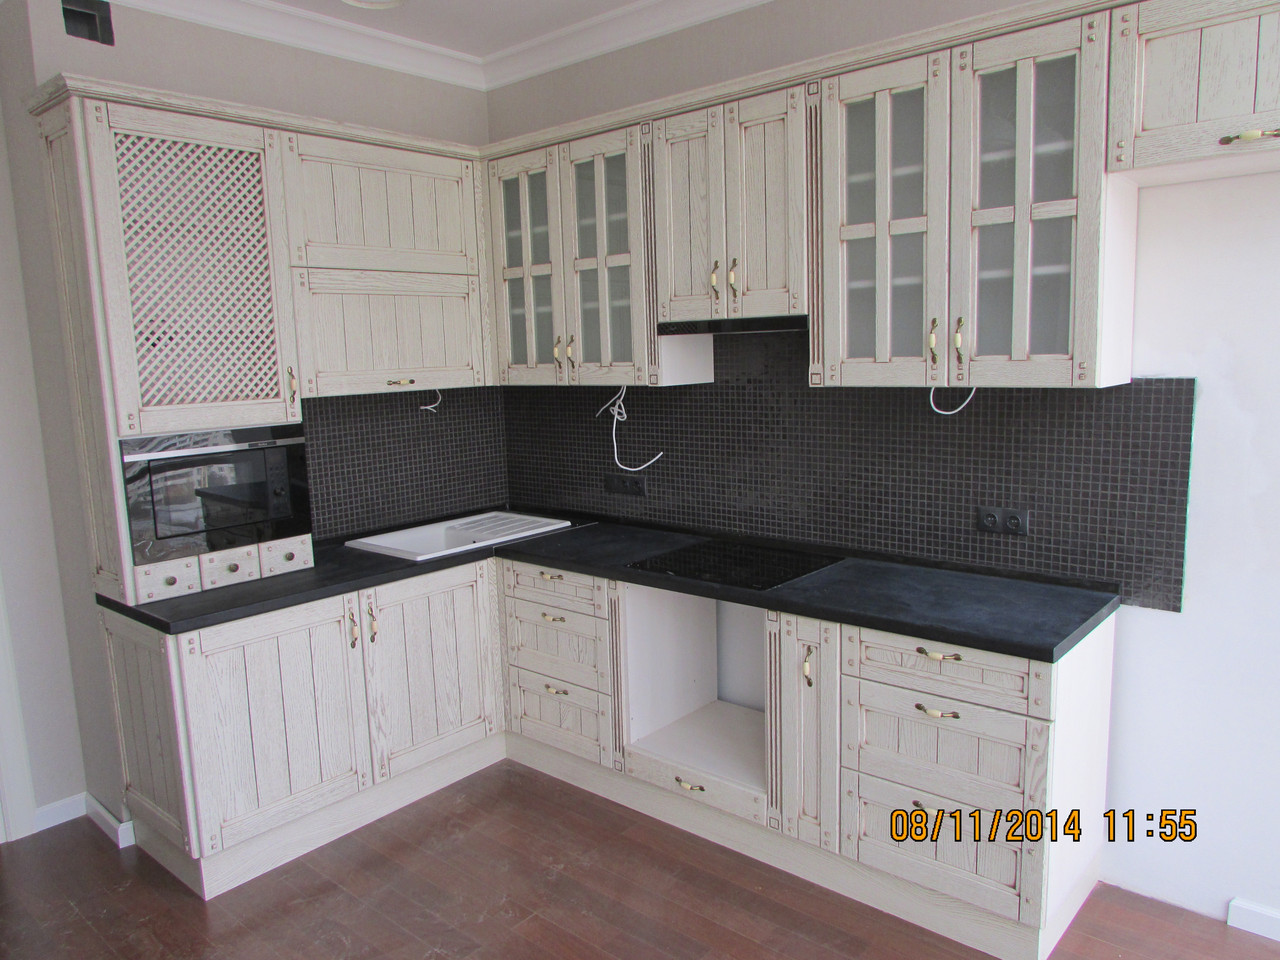 кухня в стиле прованс дормини цена 17 200 грнпогм купить в